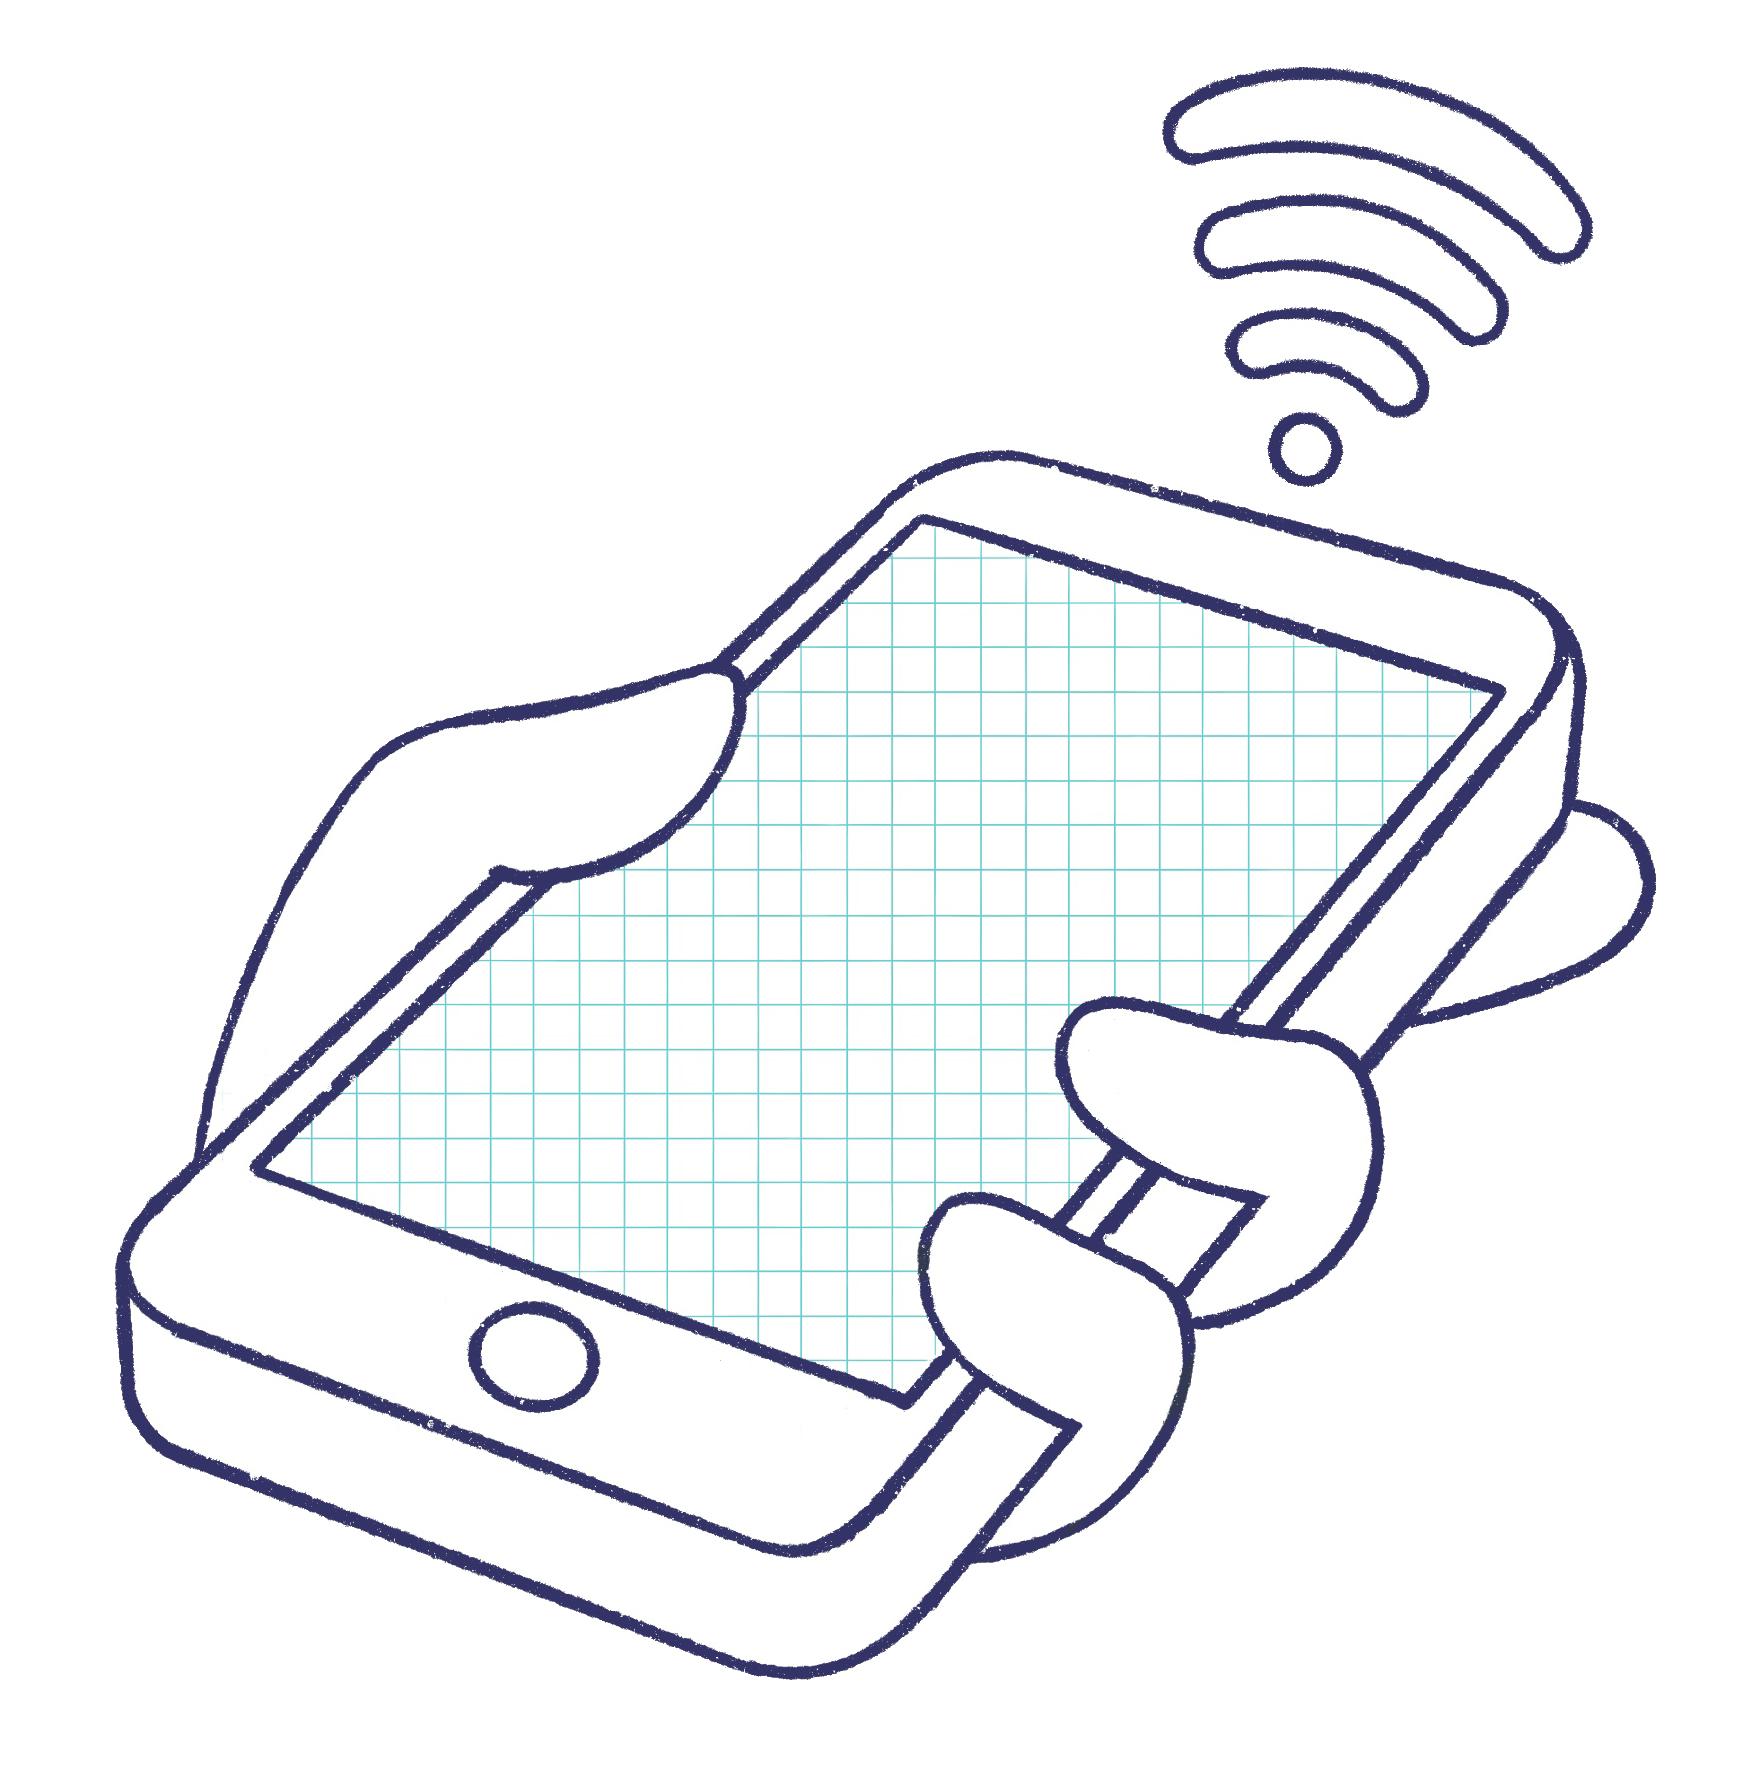 Chatbots for HR & Internal Communication